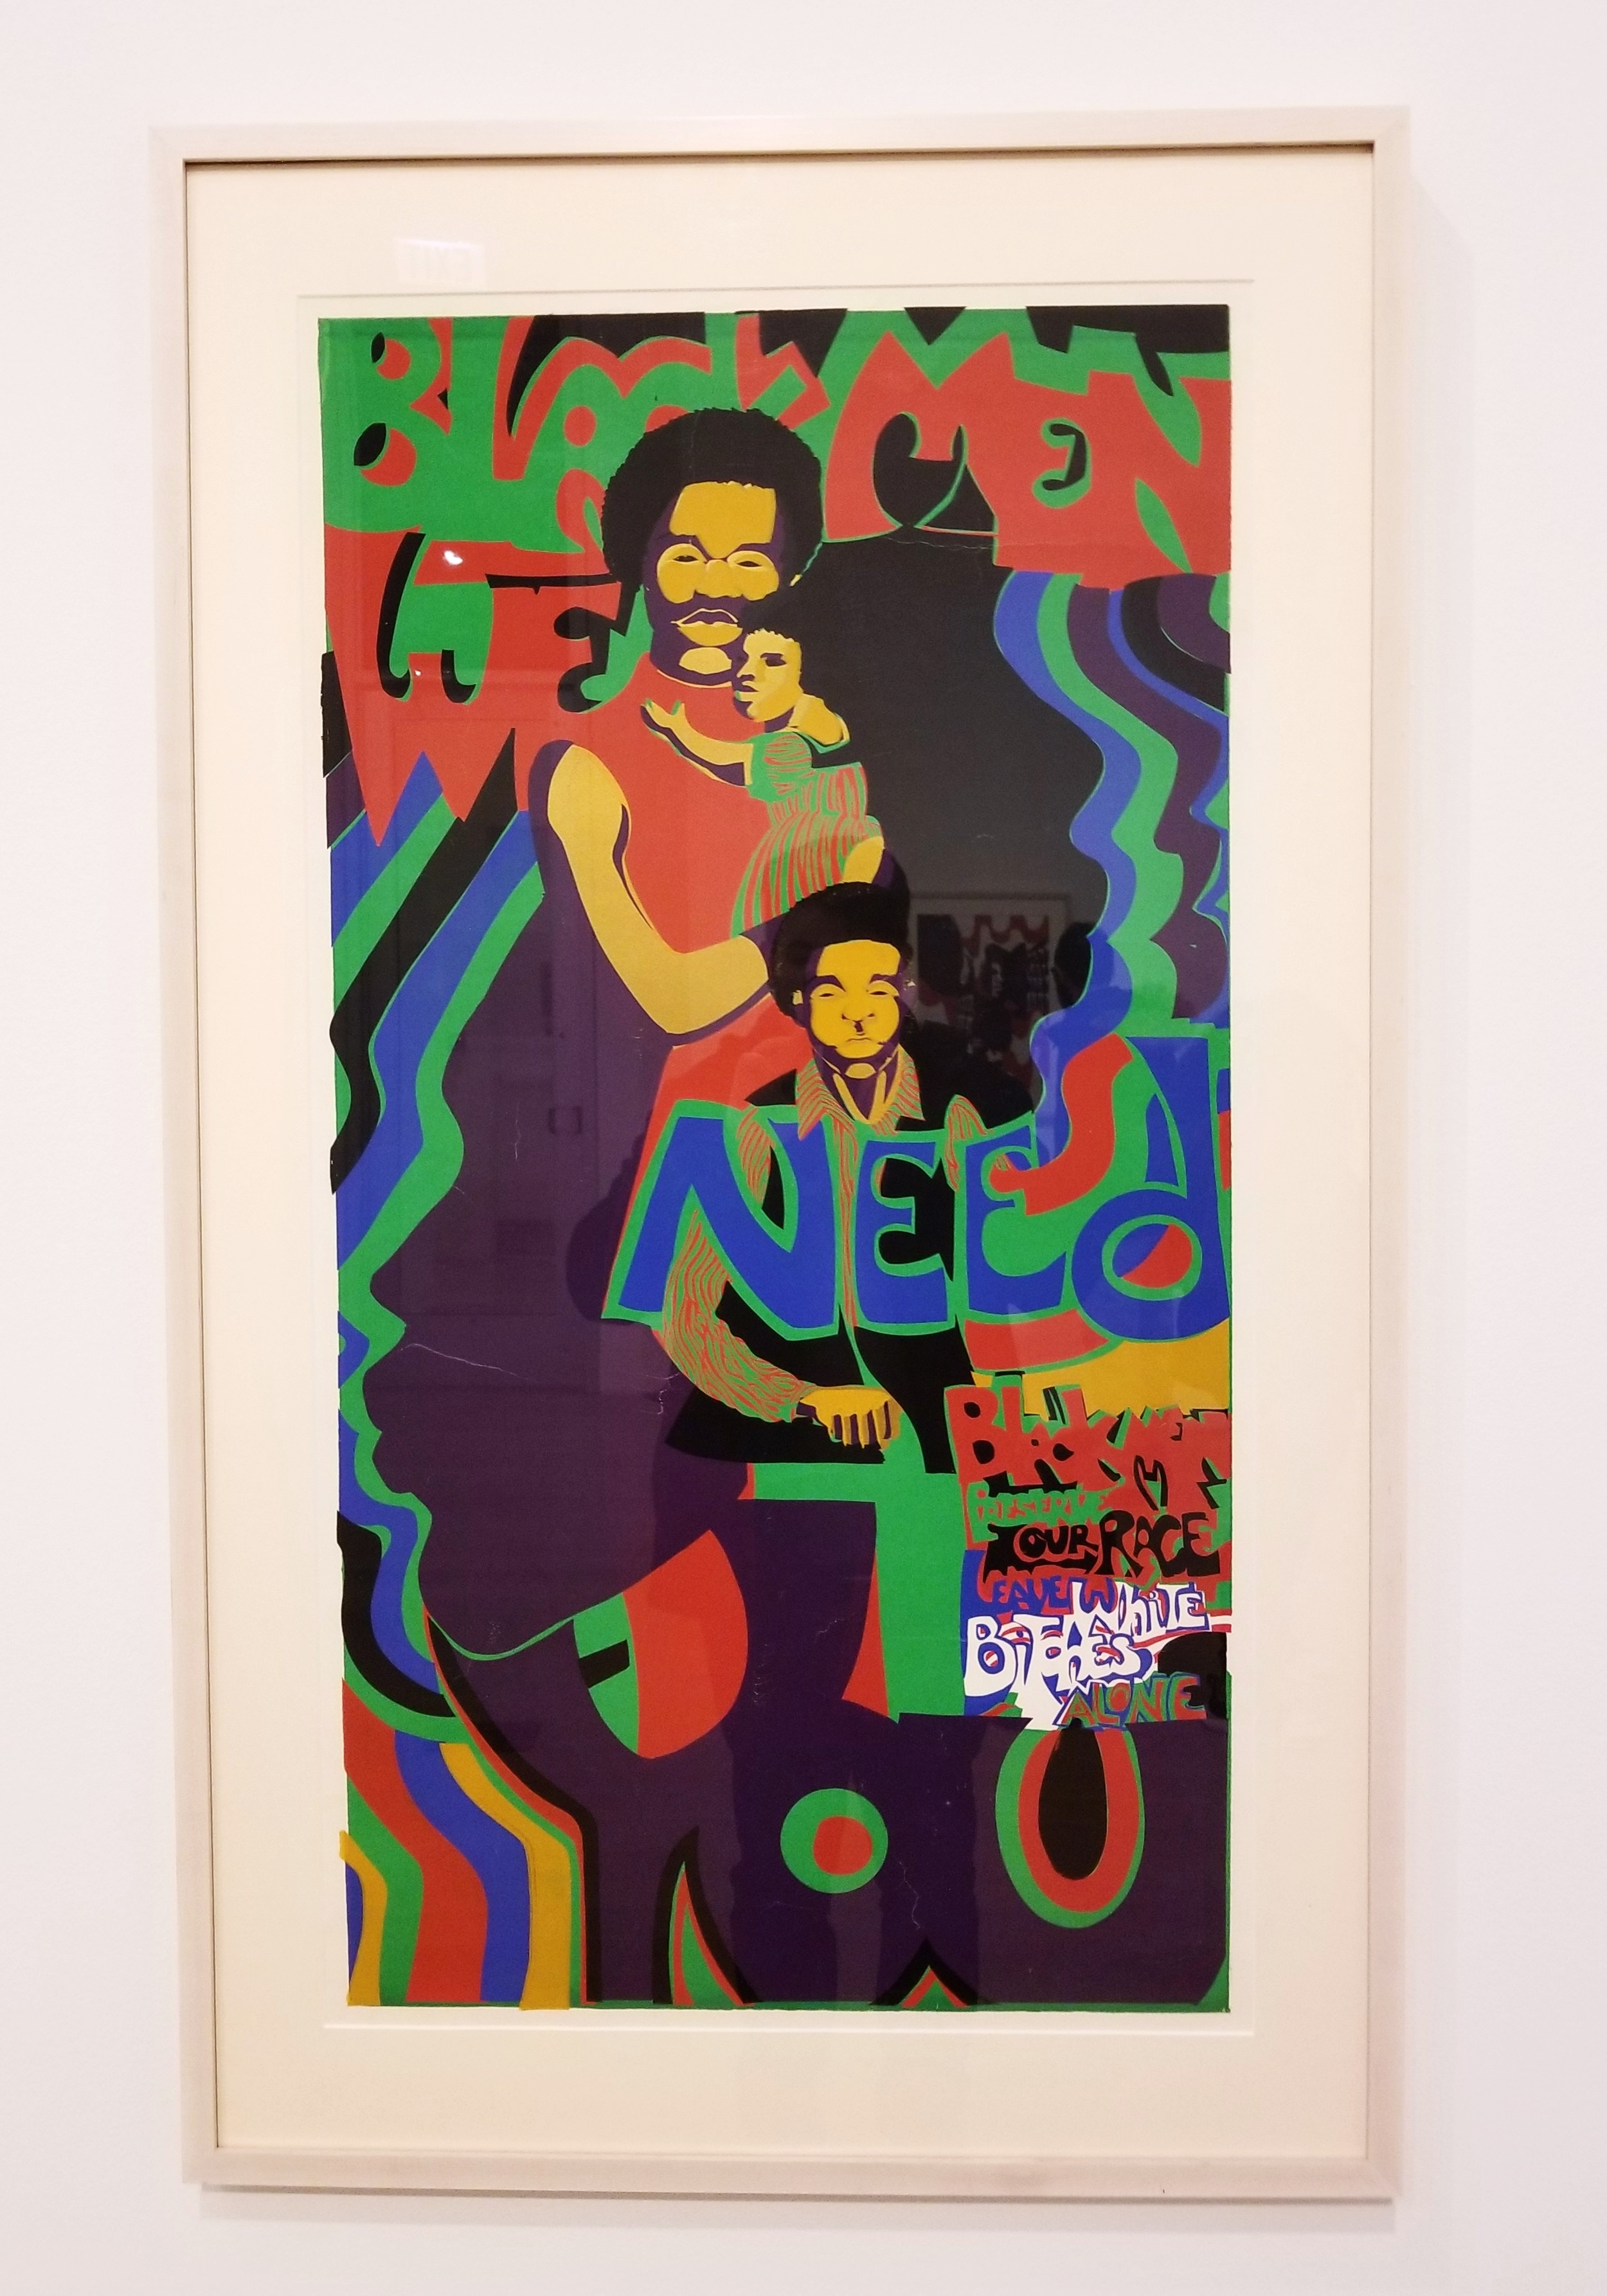 BLACK MEN WE NEED YOU, 1971 Barbara Jones-Hogu